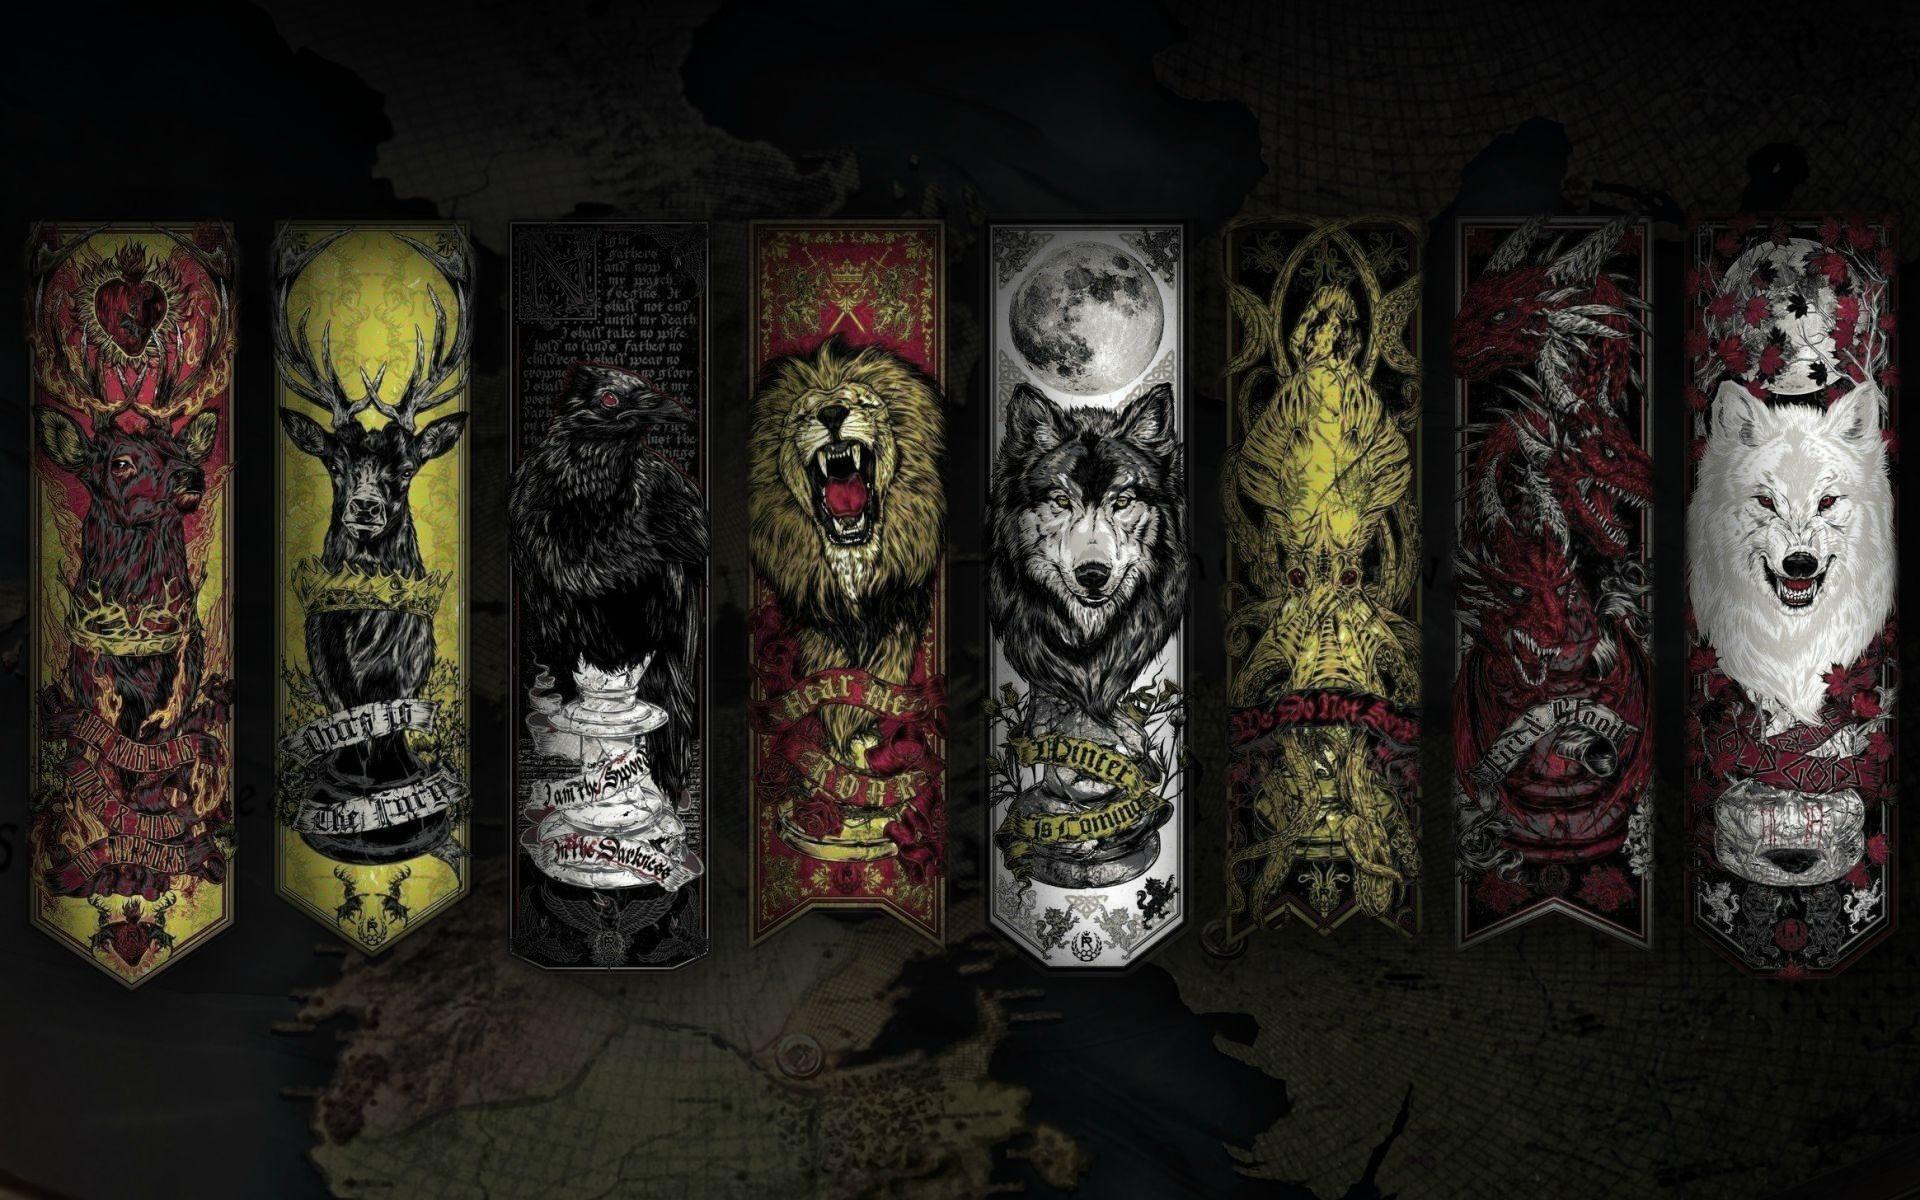 Game of Thrones Wallpaper - Fotolip